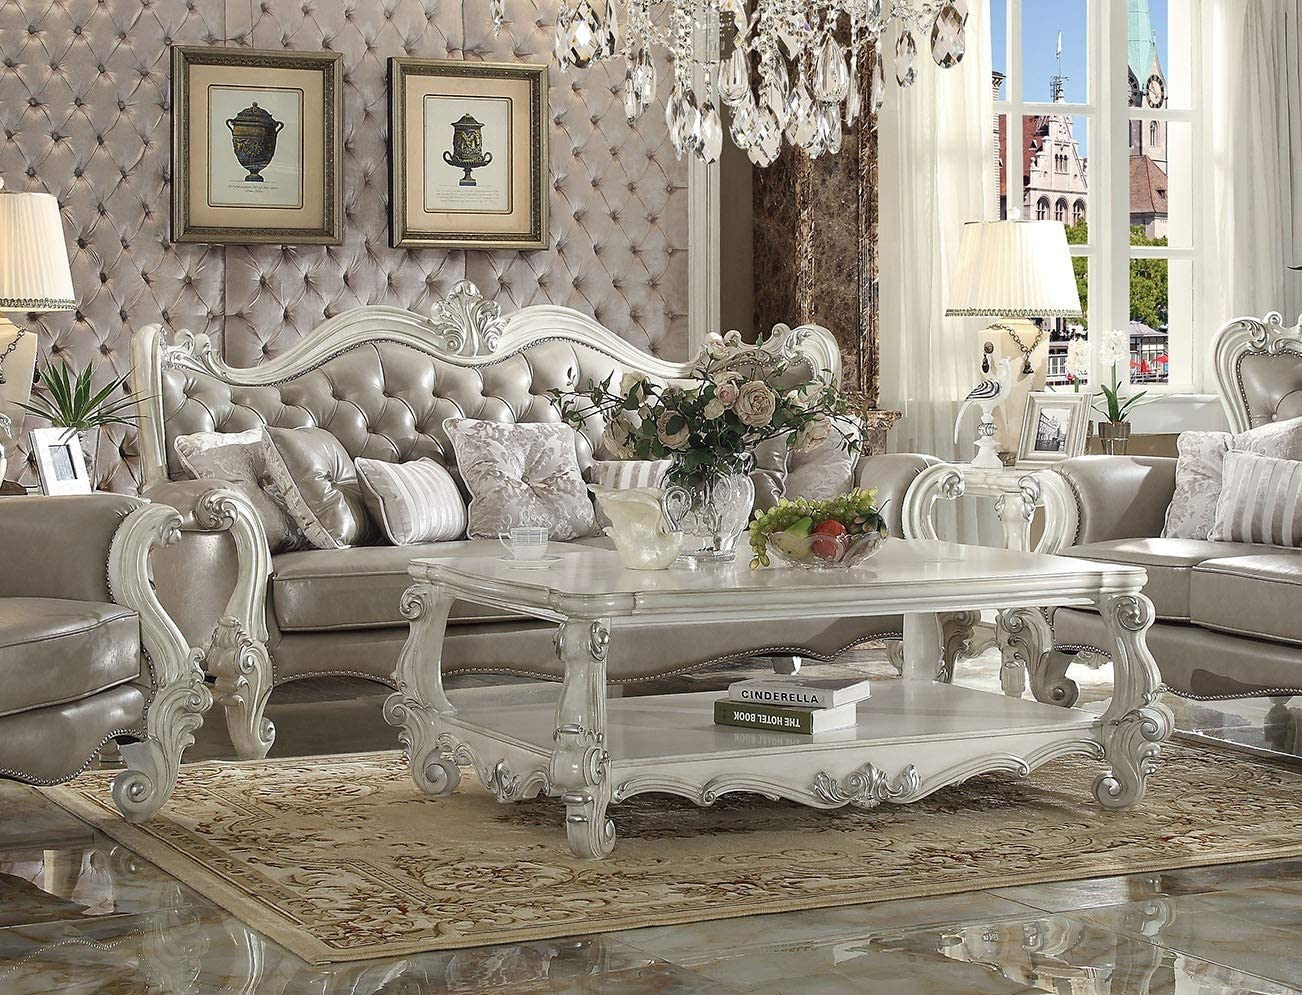 Amazon.com: Esofastore Luxurious Living Room Furniture 2pc Sofa & Loveseat Traditional Gray Sofa Set: Furniture & Decor